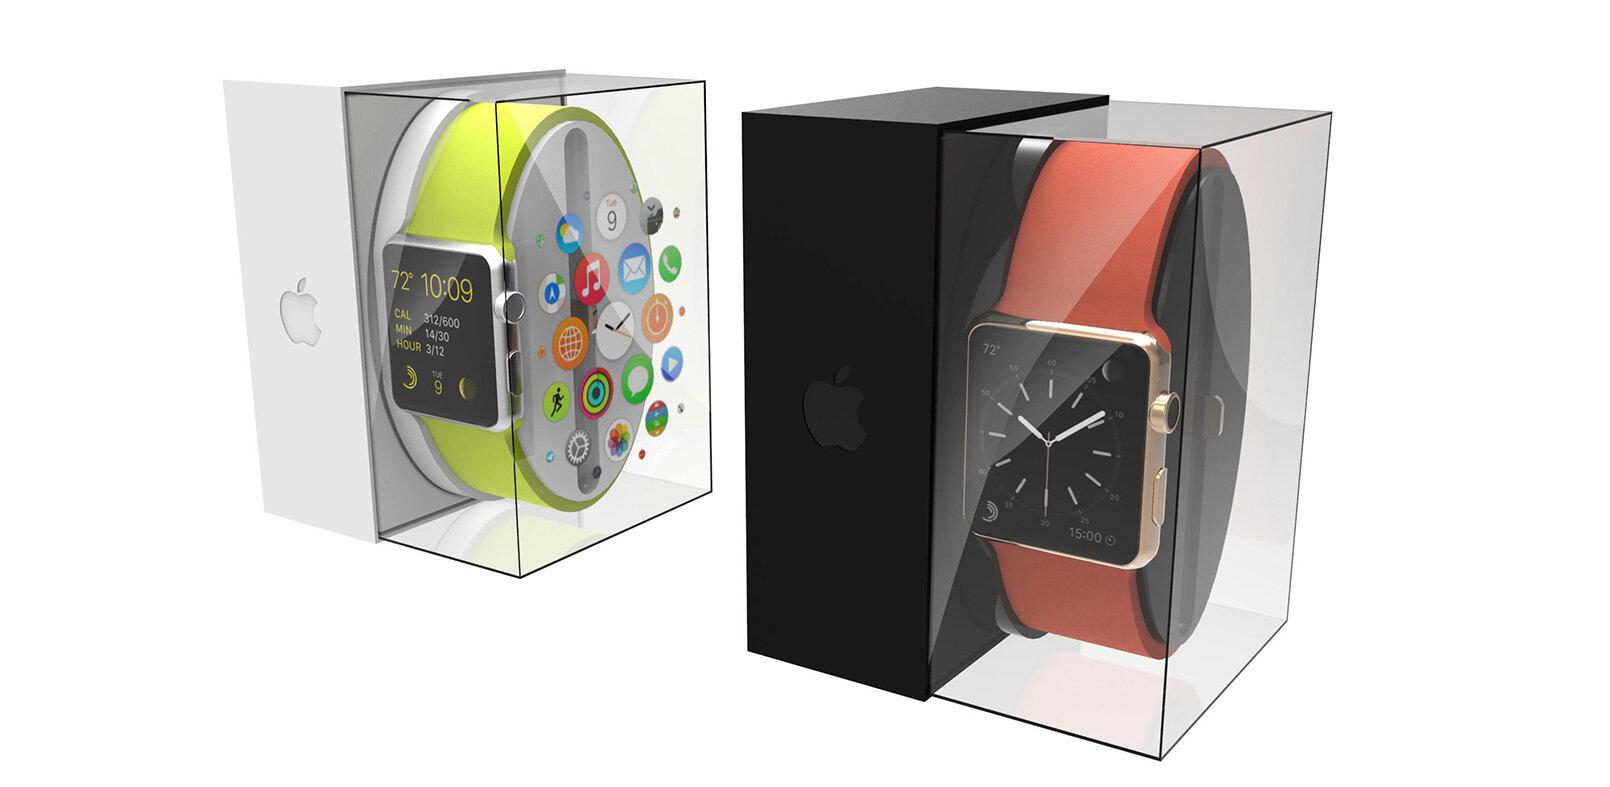 Apple-Watch-Smartwatch-Packaging-Design-Iwatch-Indable-Technology-4.JPG